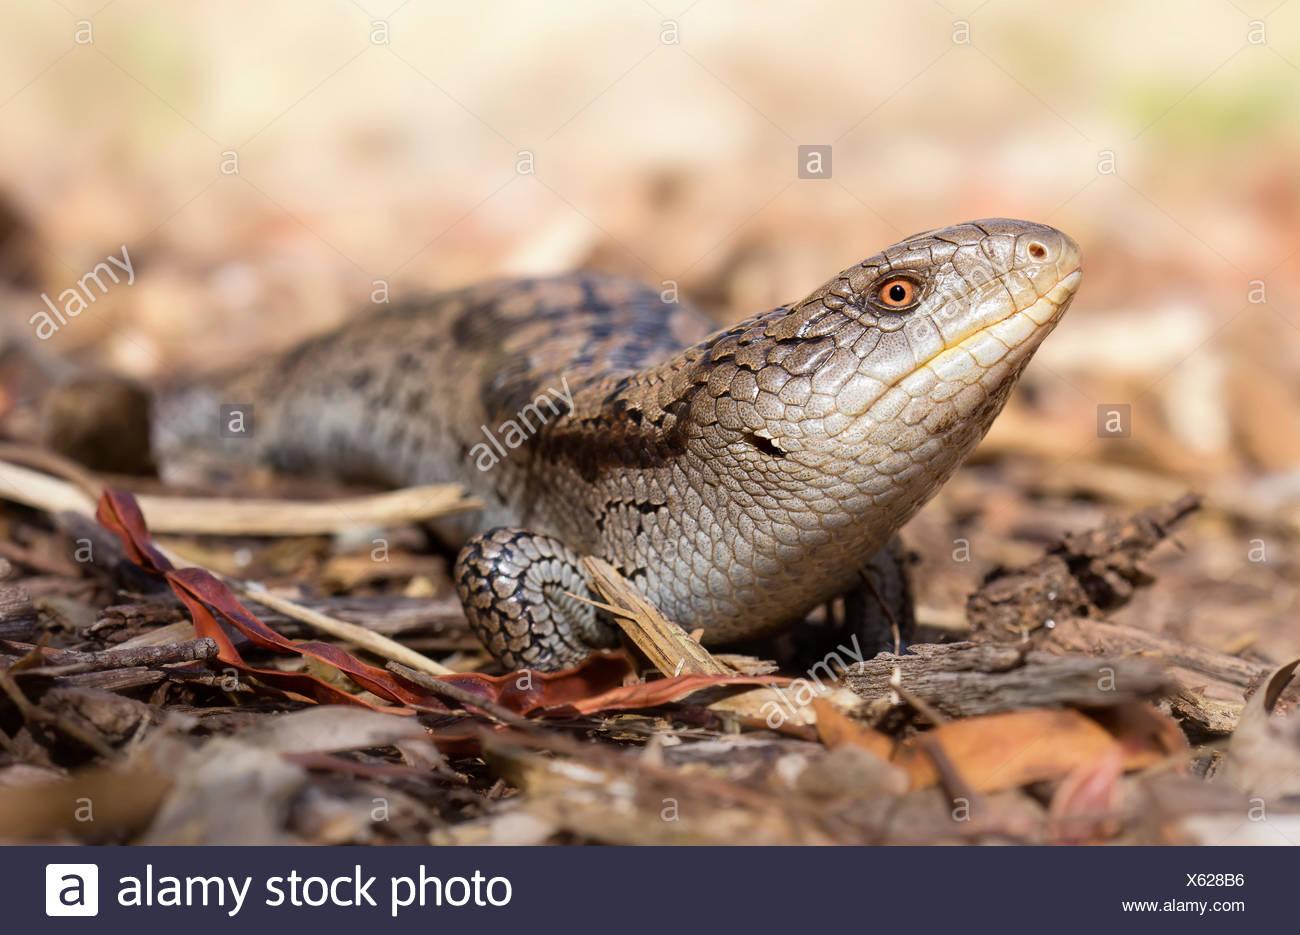 Australia, Blotched blue-tongue lizard crawling on ground - Stock Image